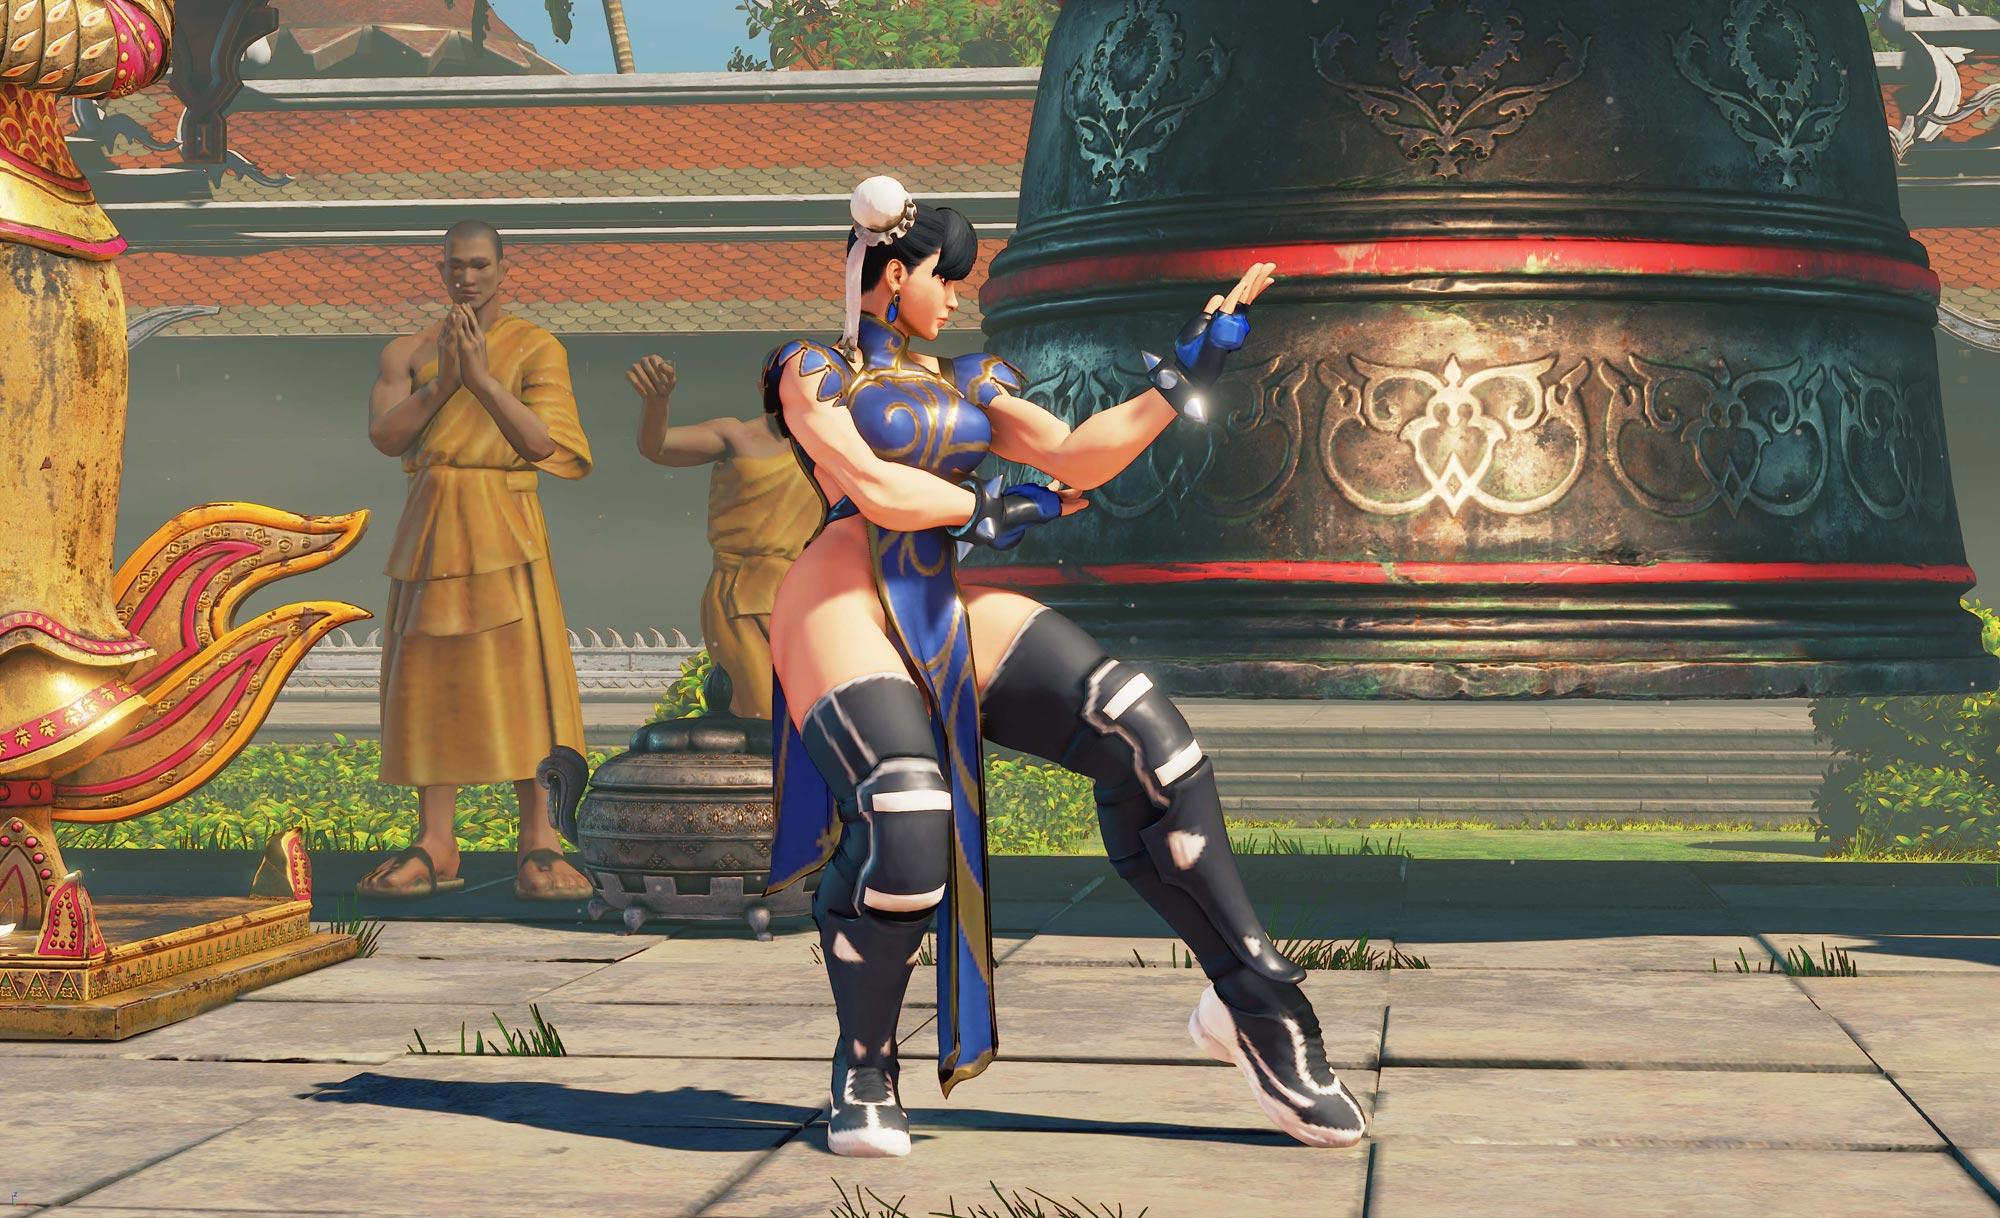 Chun-Li's Street Fighter 5 wardrobe 11 out of 13 image gallery